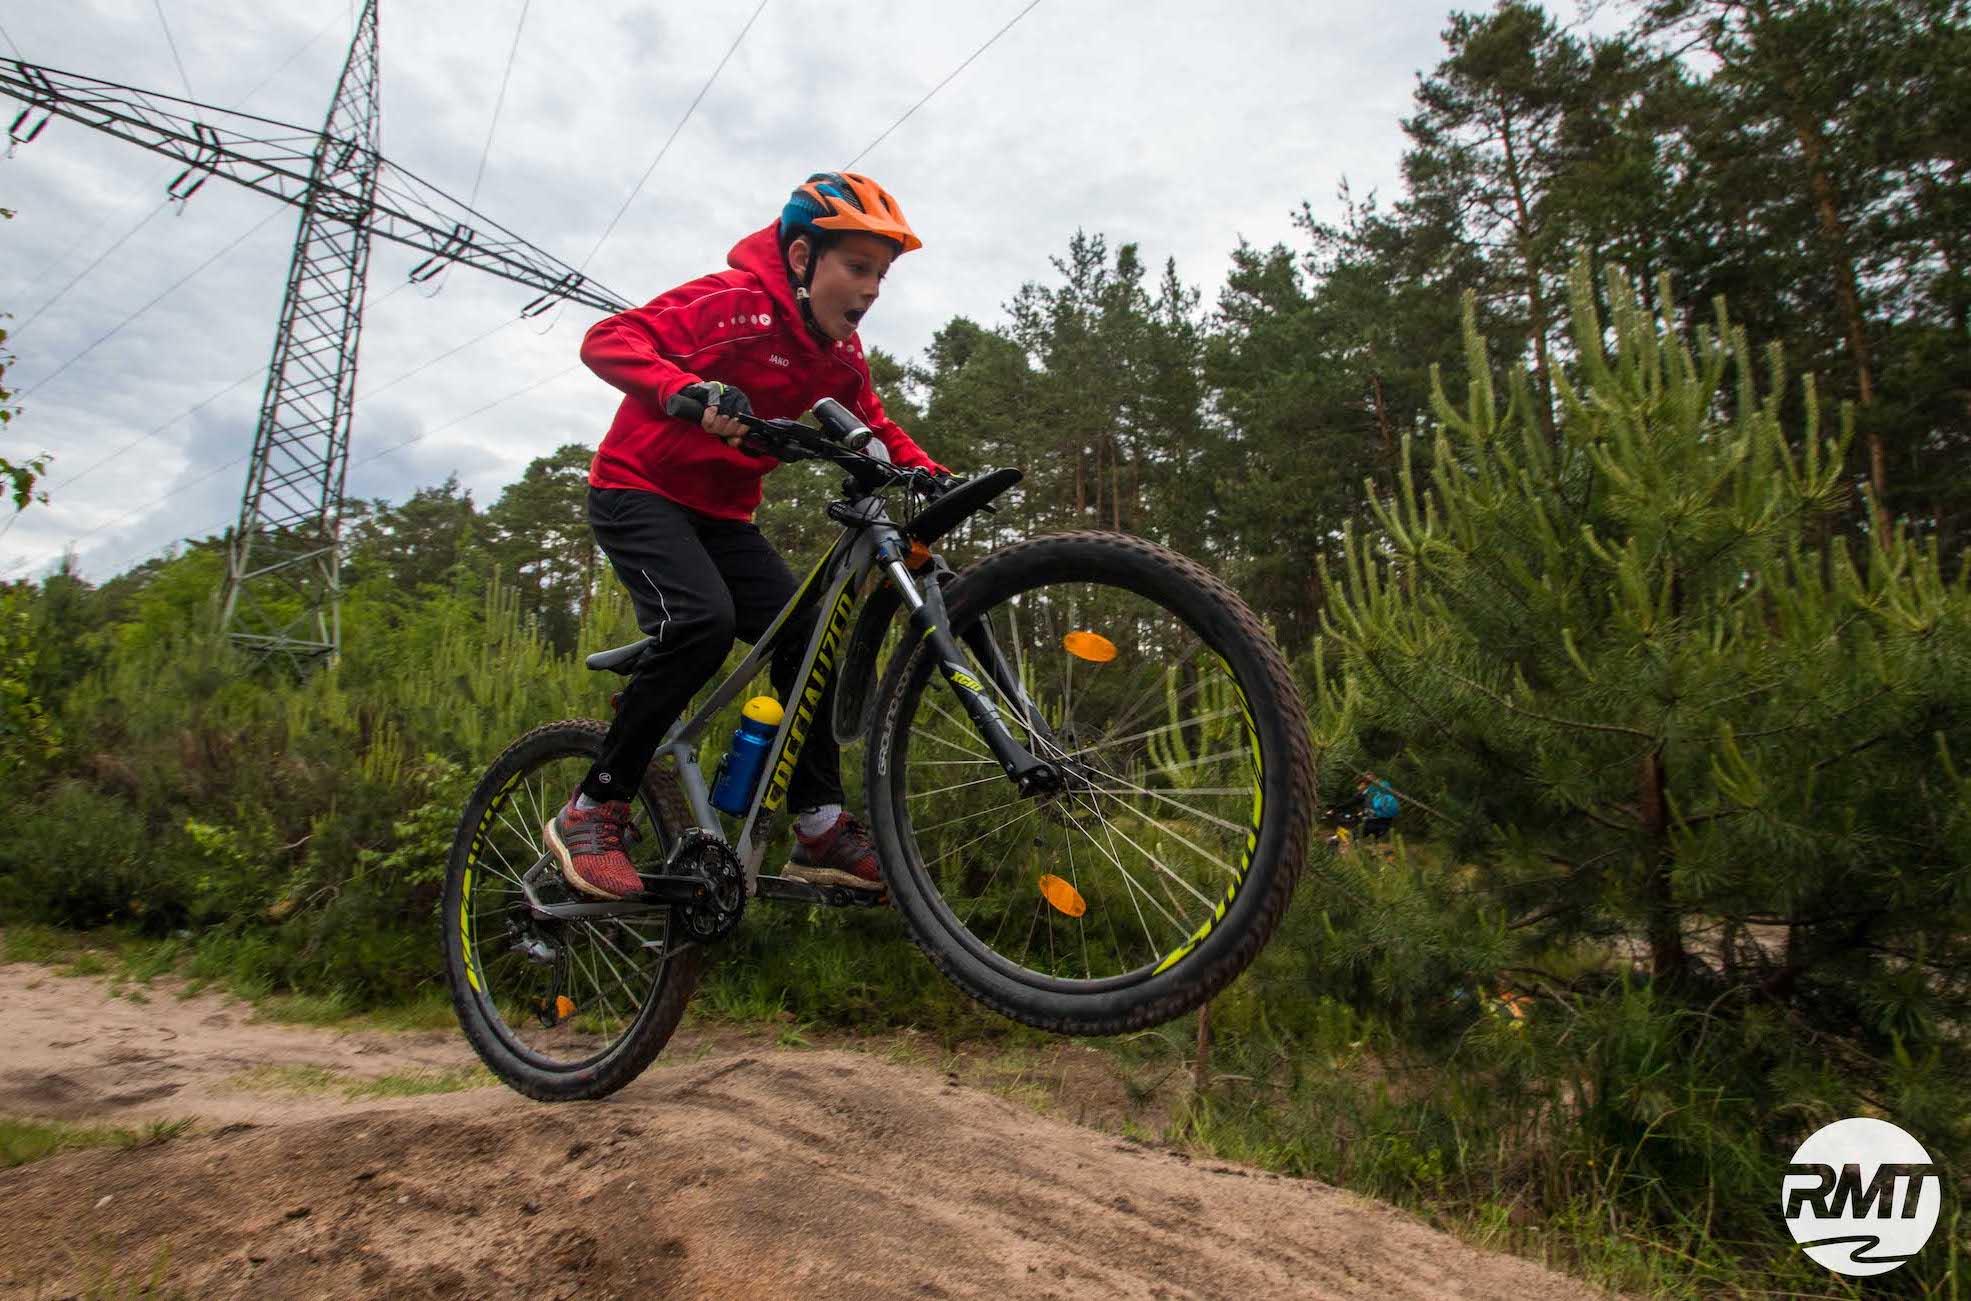 Mountainbike Kinder Kurs in Bad Orb |Spessart - 8-12 Jahre Kids - Rock my Trail Fahrtechnik Bikeschule - 5